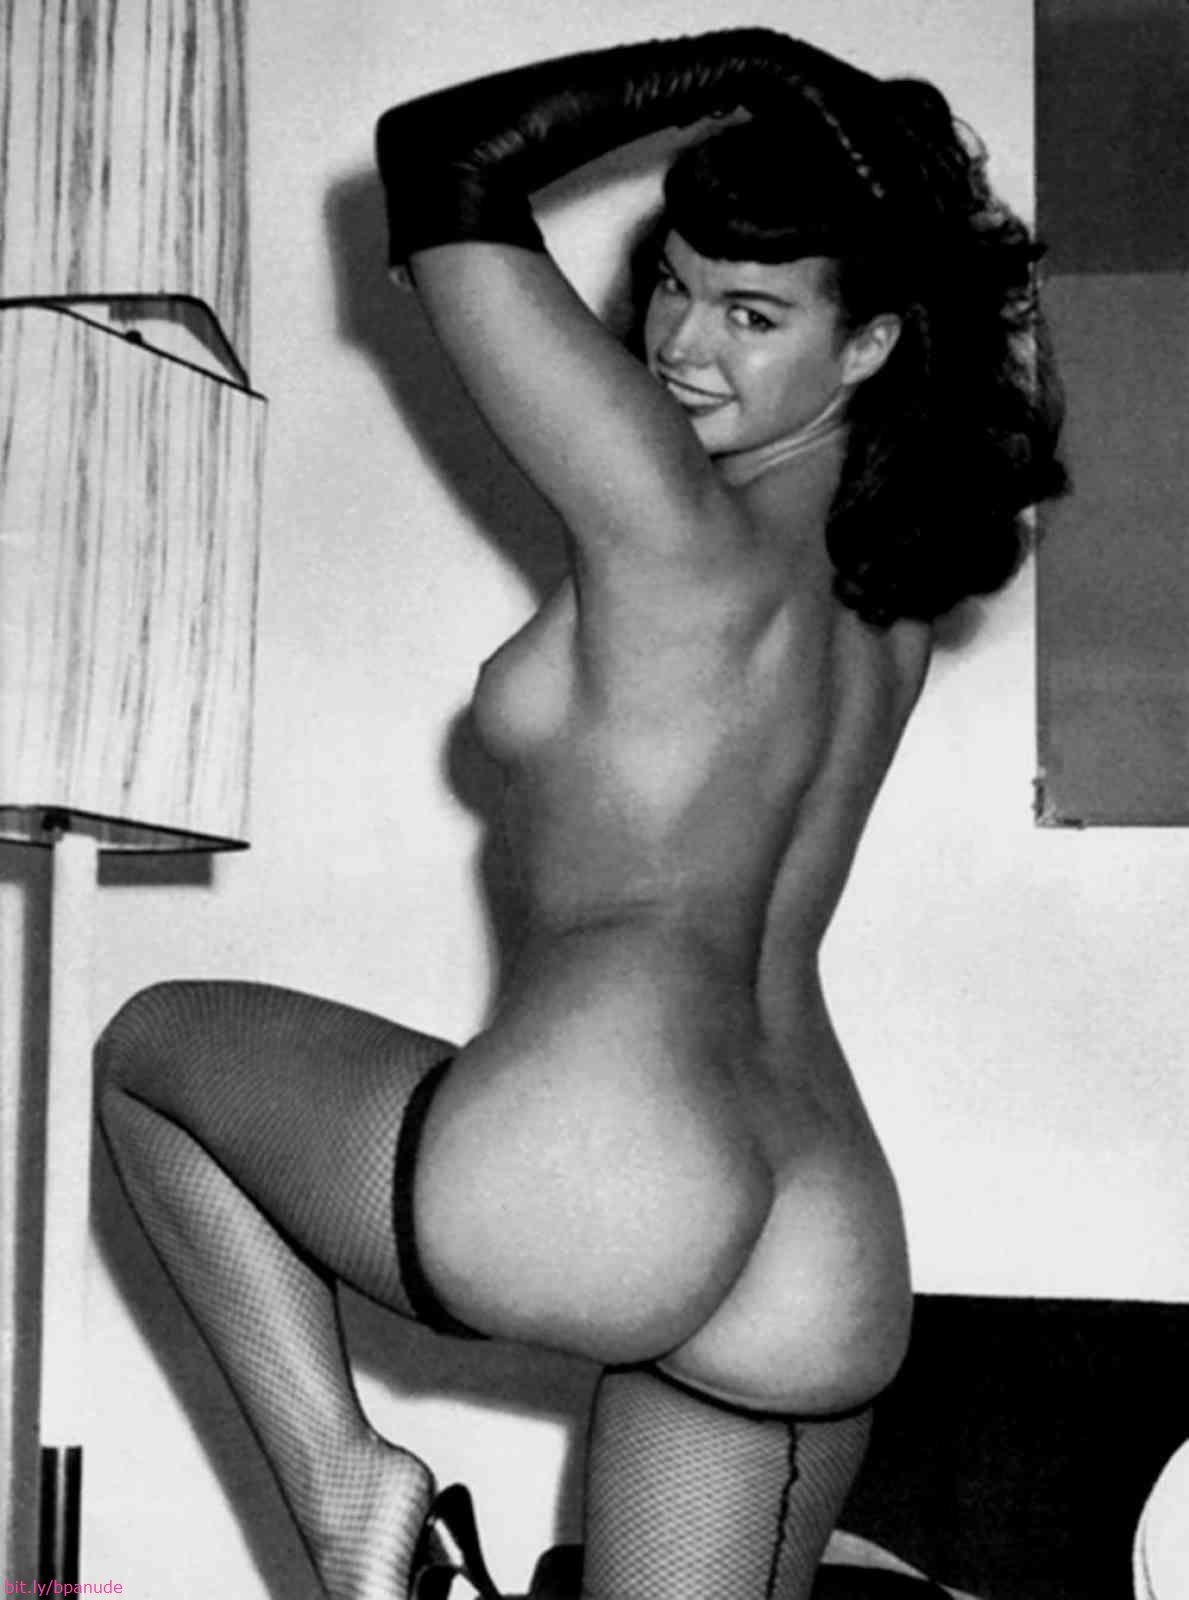 betty paige nude pics